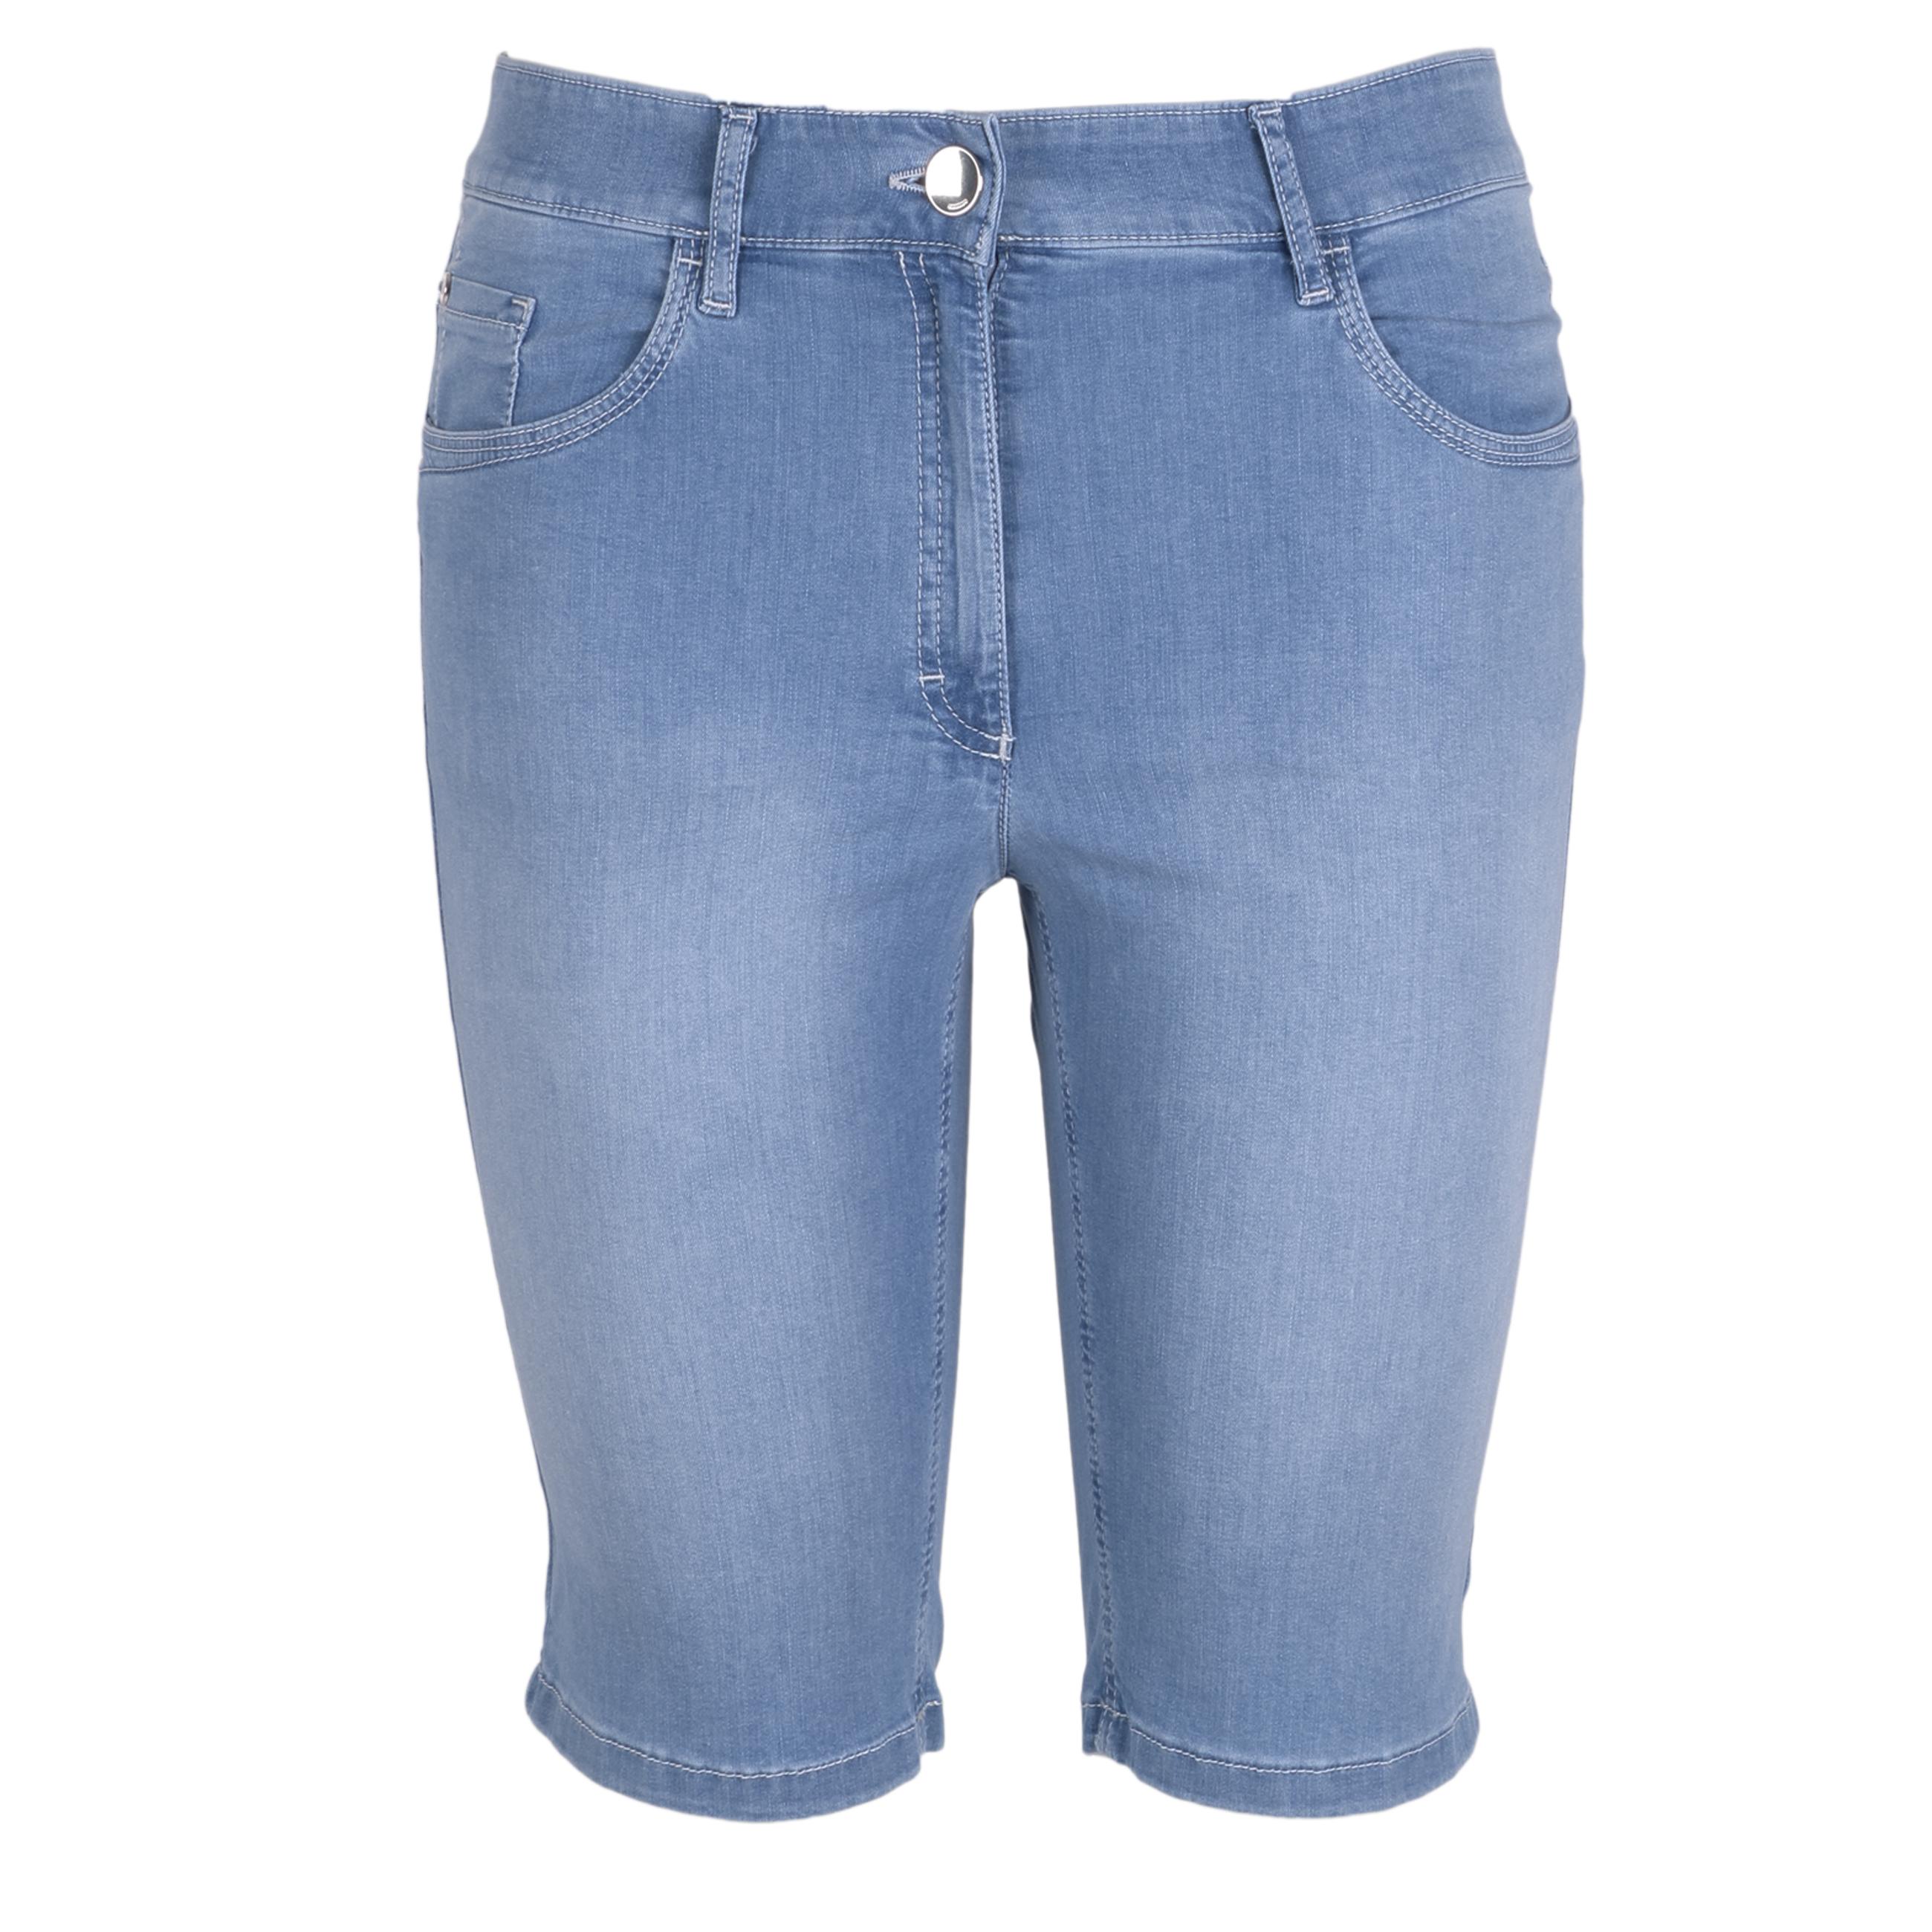 Zerres Damen Jeans Shorts Sarah 38